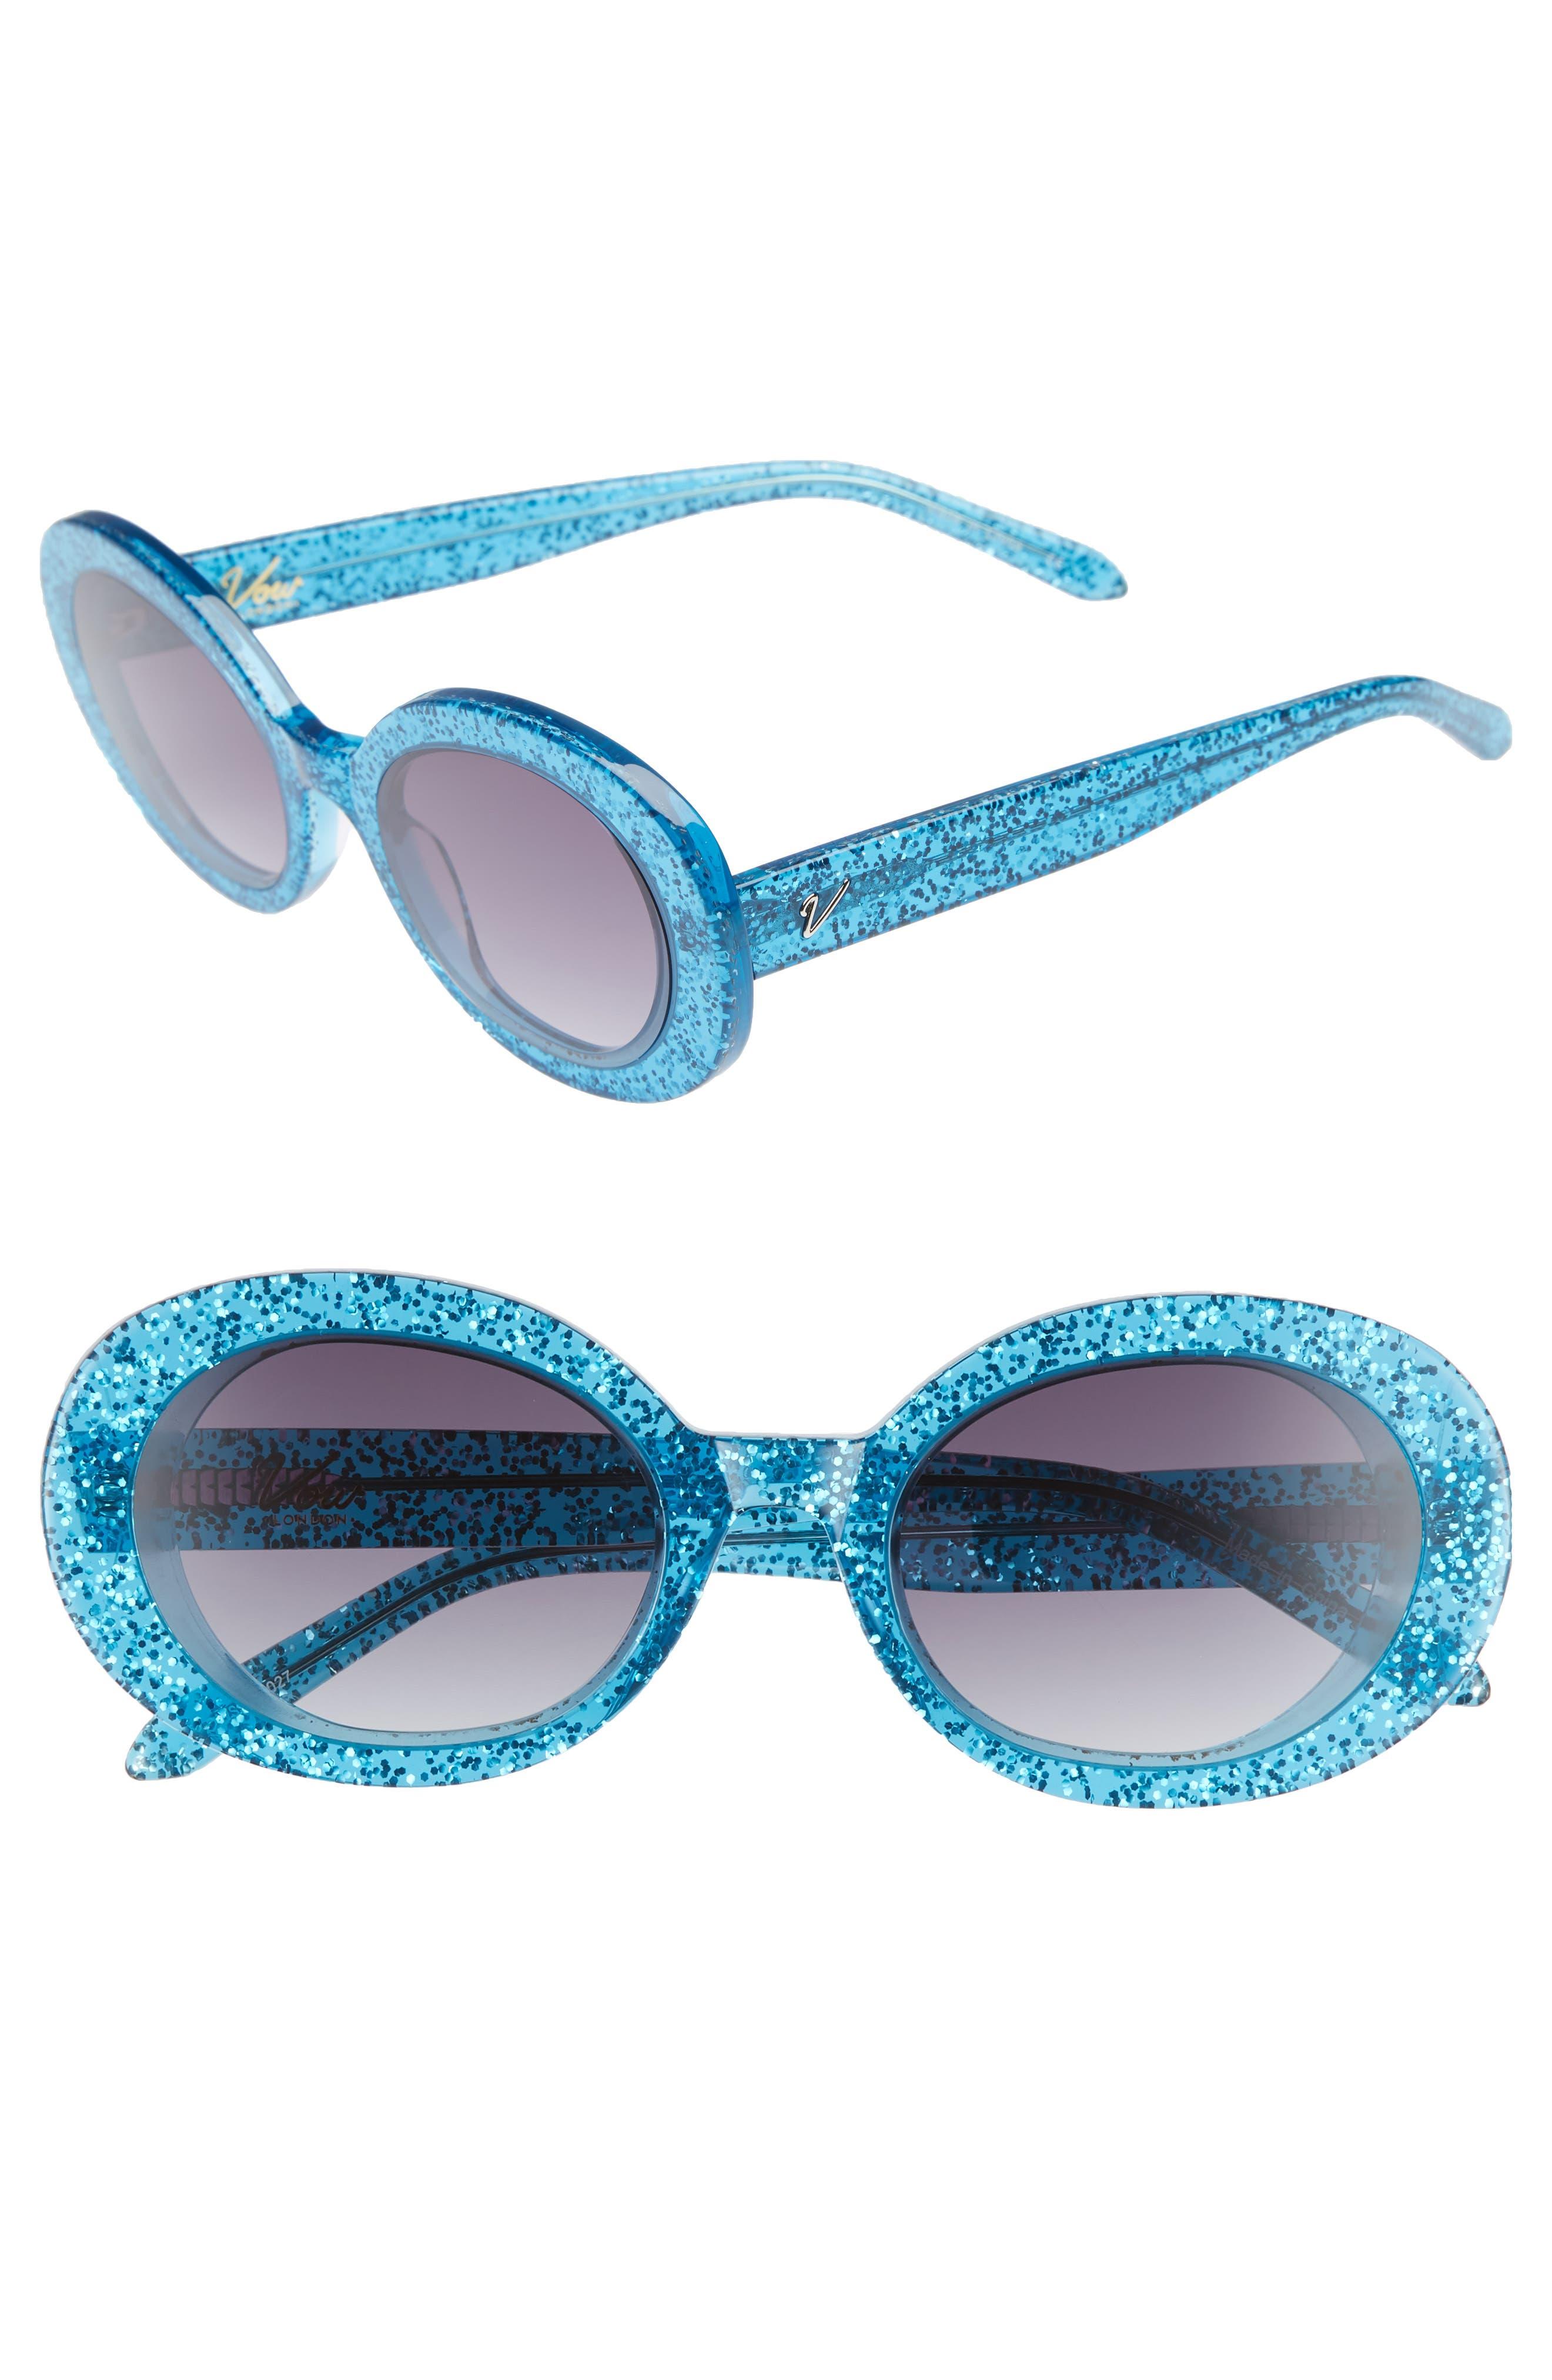 Selena 53mm Oval Sunglasses,                         Main,                         color, BLUE GLITTER/ SMOKE